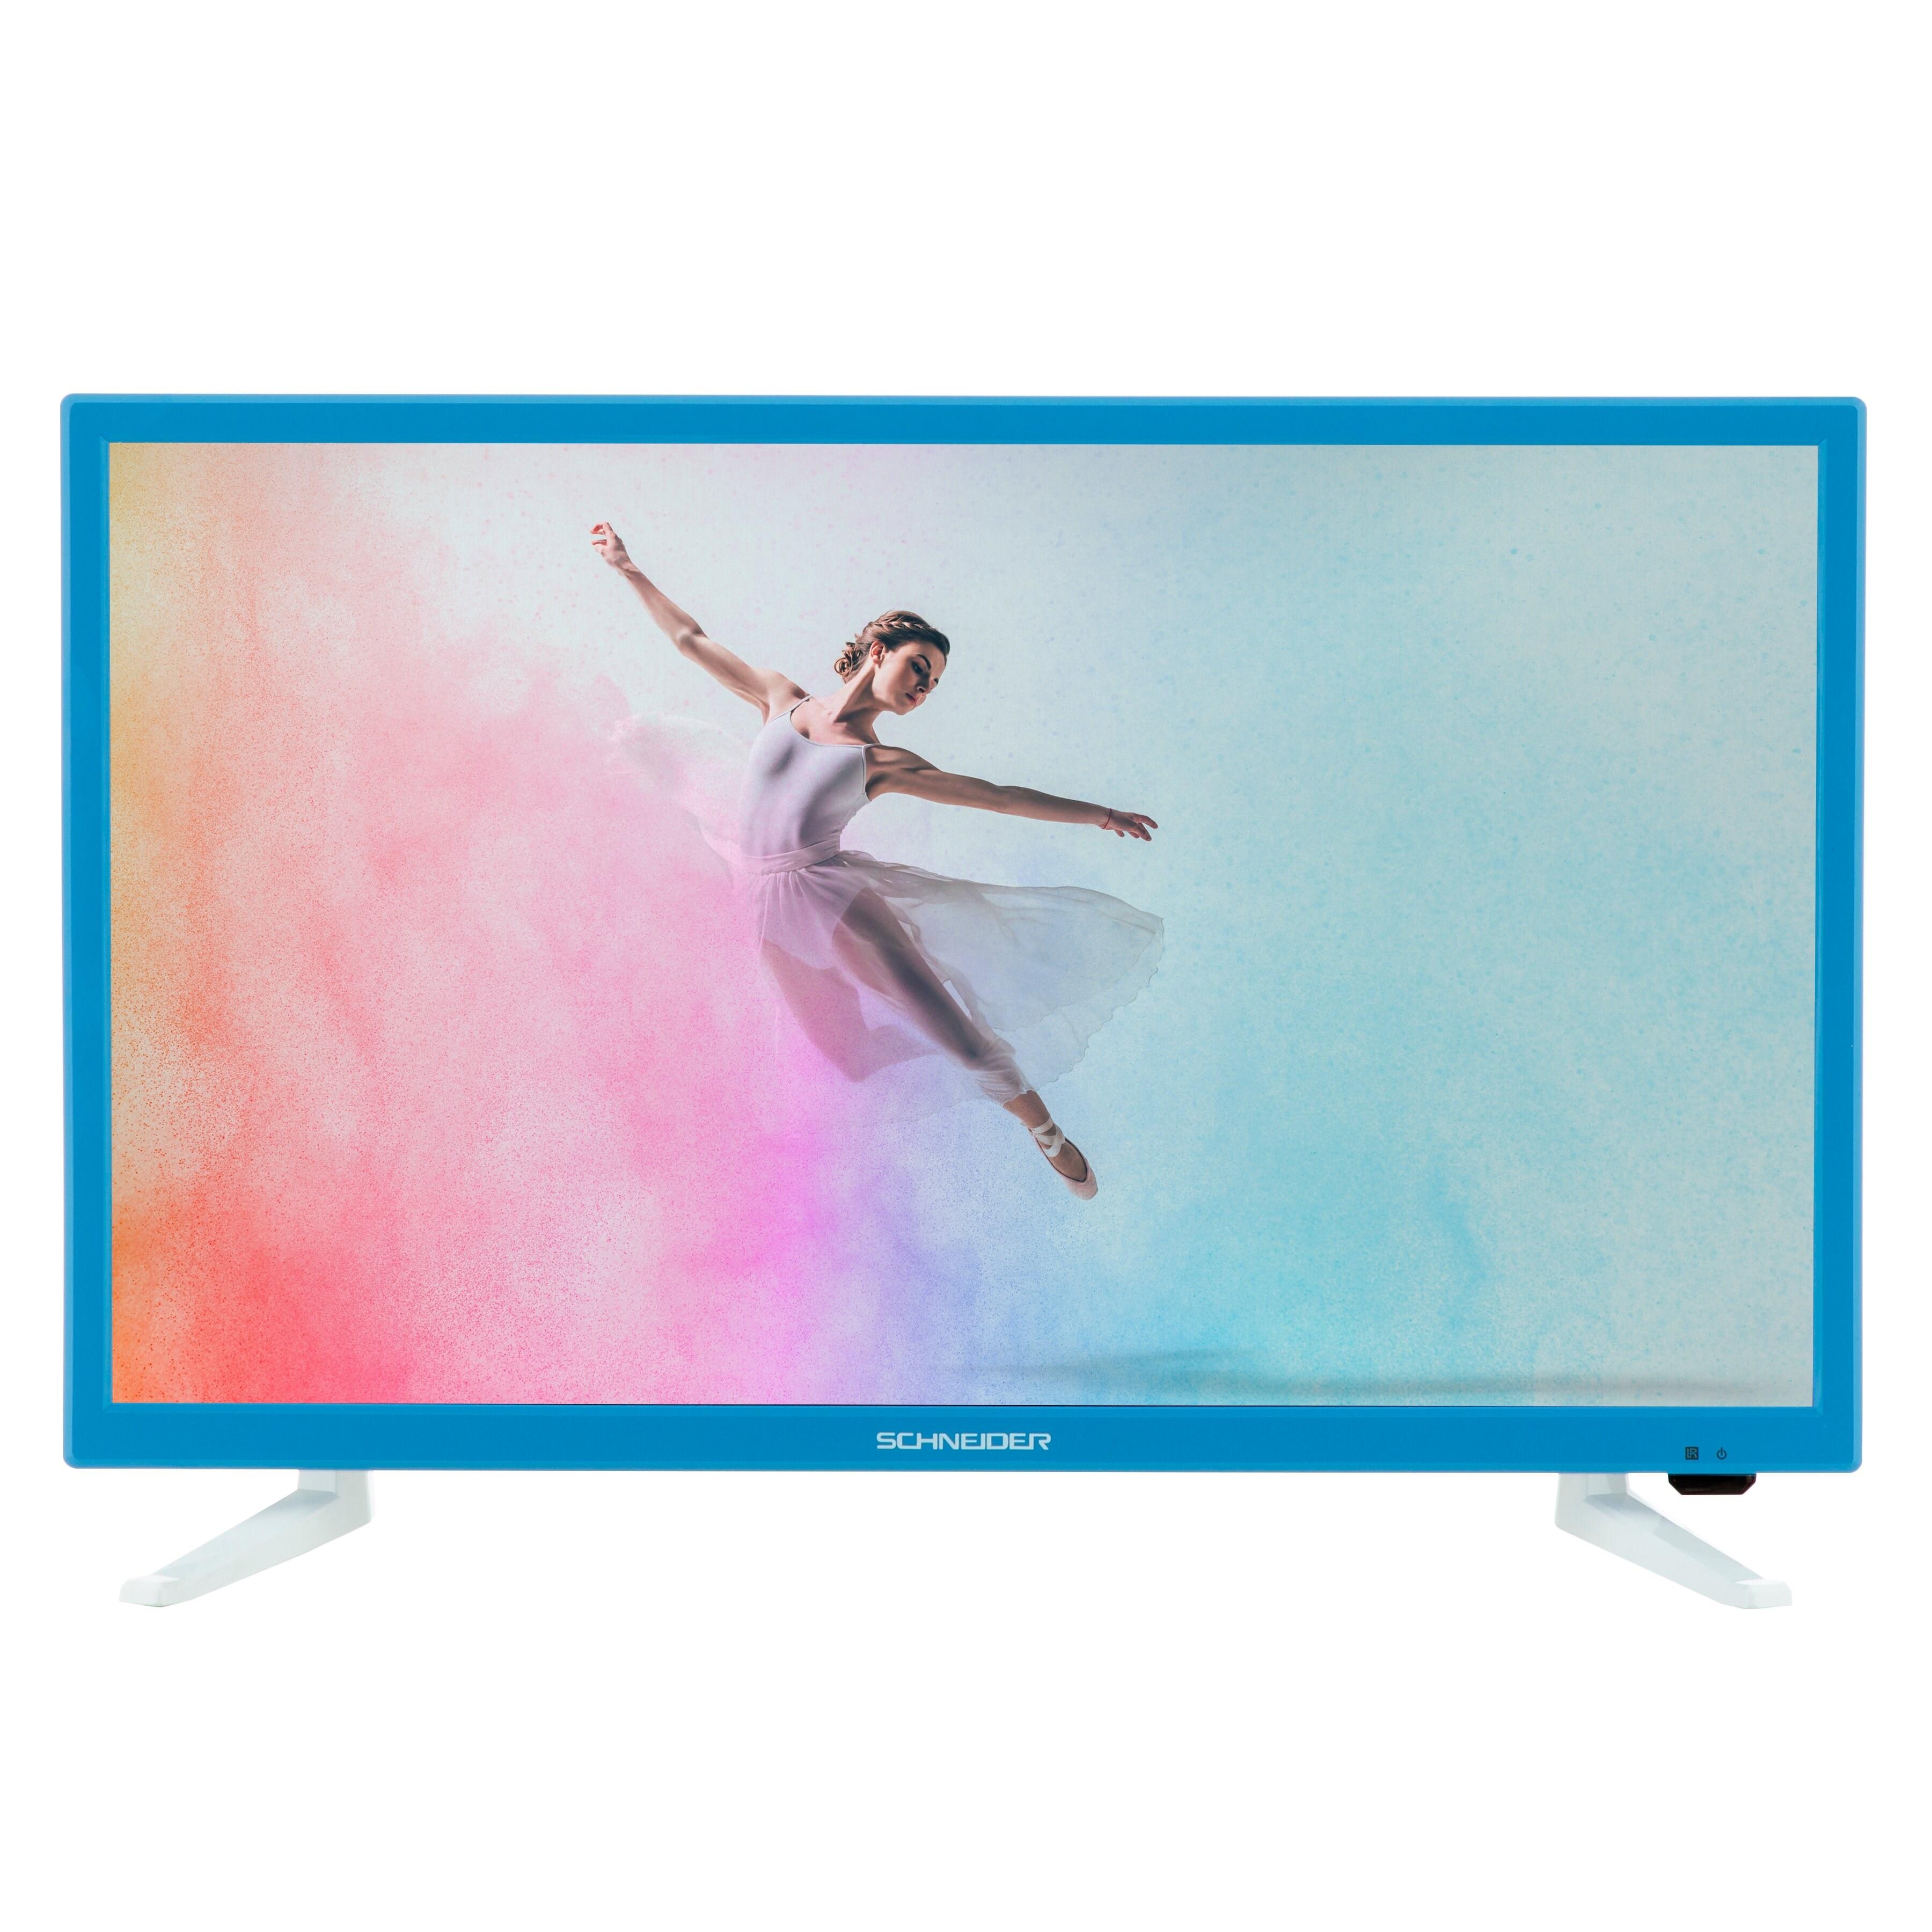 Schneider SCH13BLU TV LED 23,6 ''RAINBOW HD USB PVR Blue